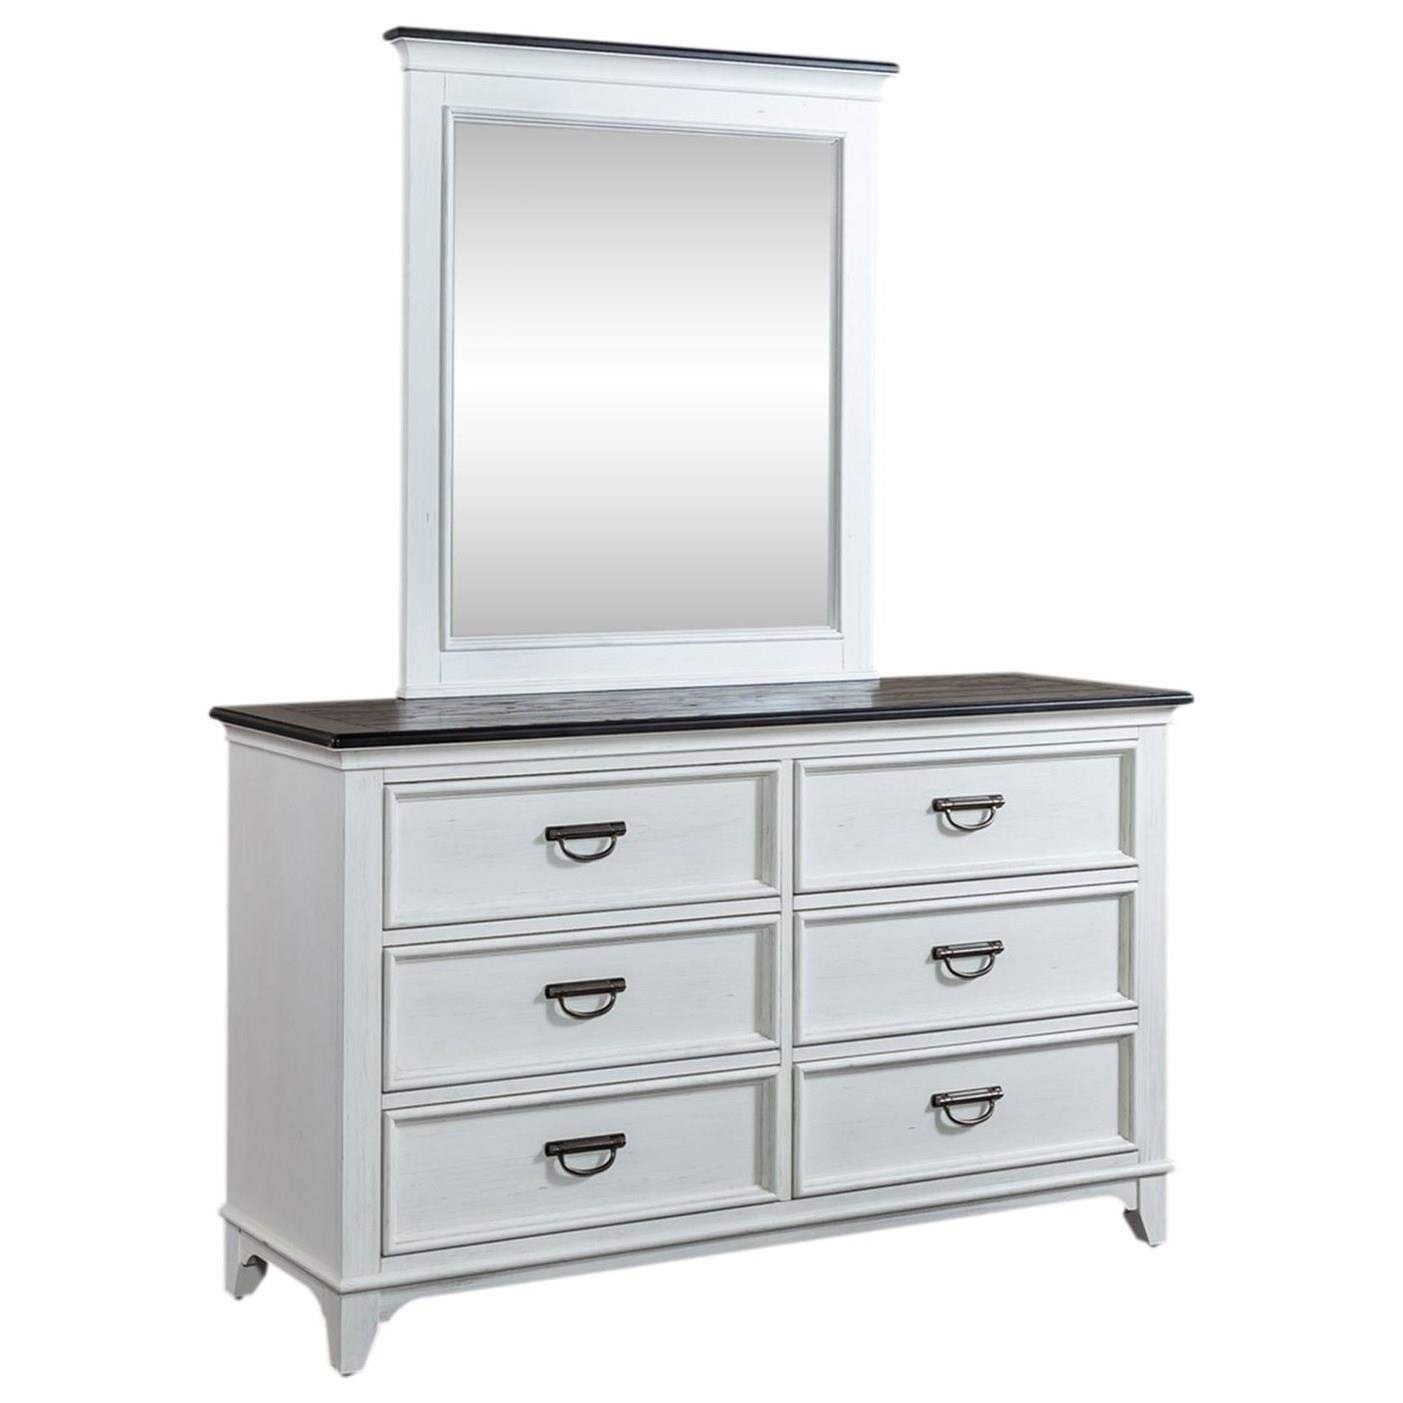 Allyson Park Dresser & Mirror by Libby at Walker's Furniture